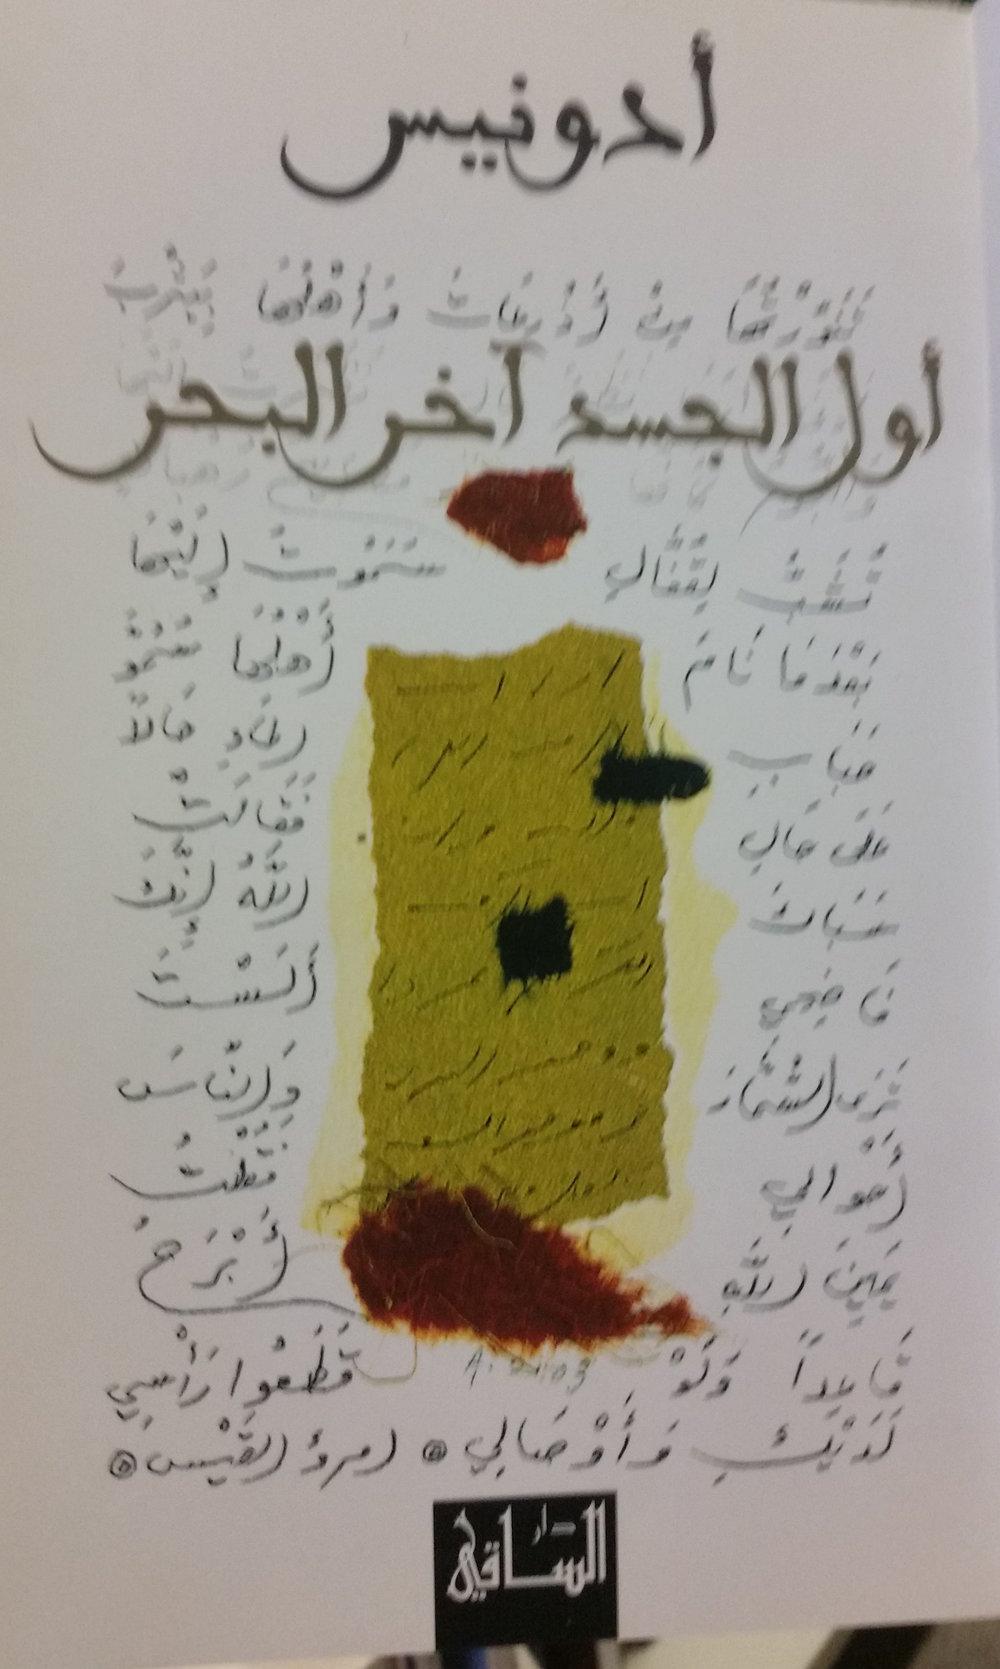 Bayrūt: Dār al-Sāqī, 2005.